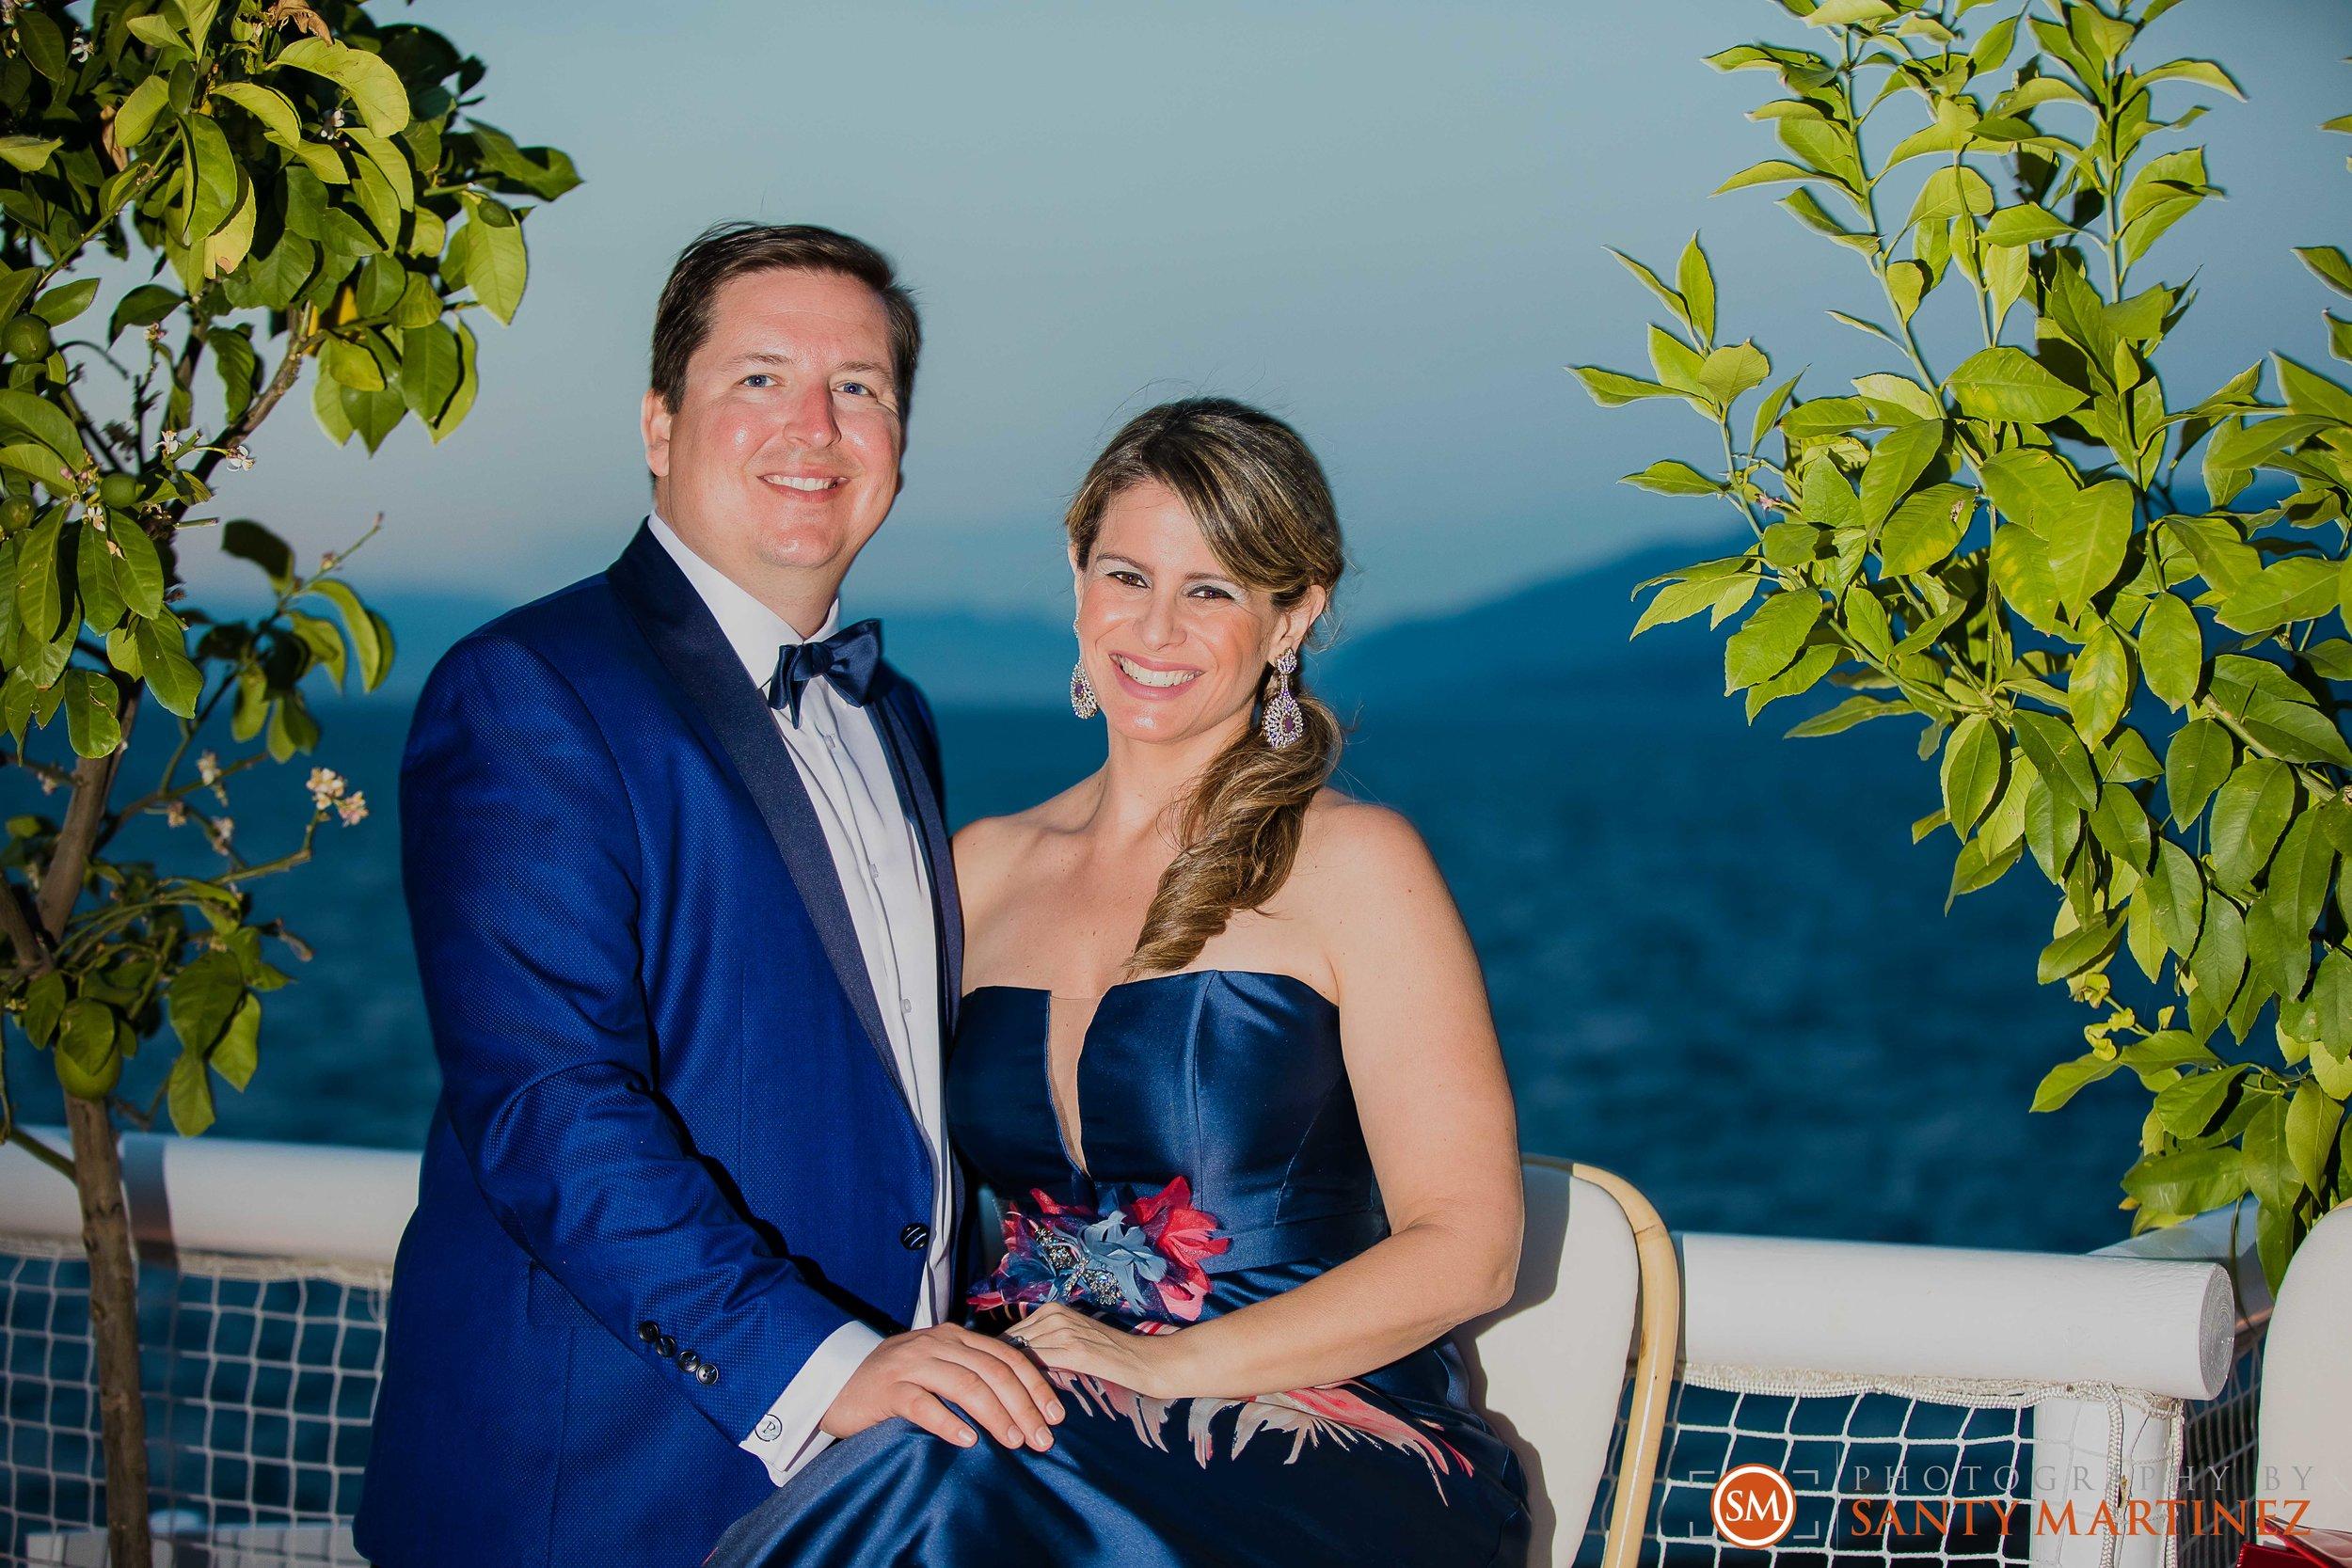 Wedding Capri Italy - Photography by Santy Martinez-66.jpg